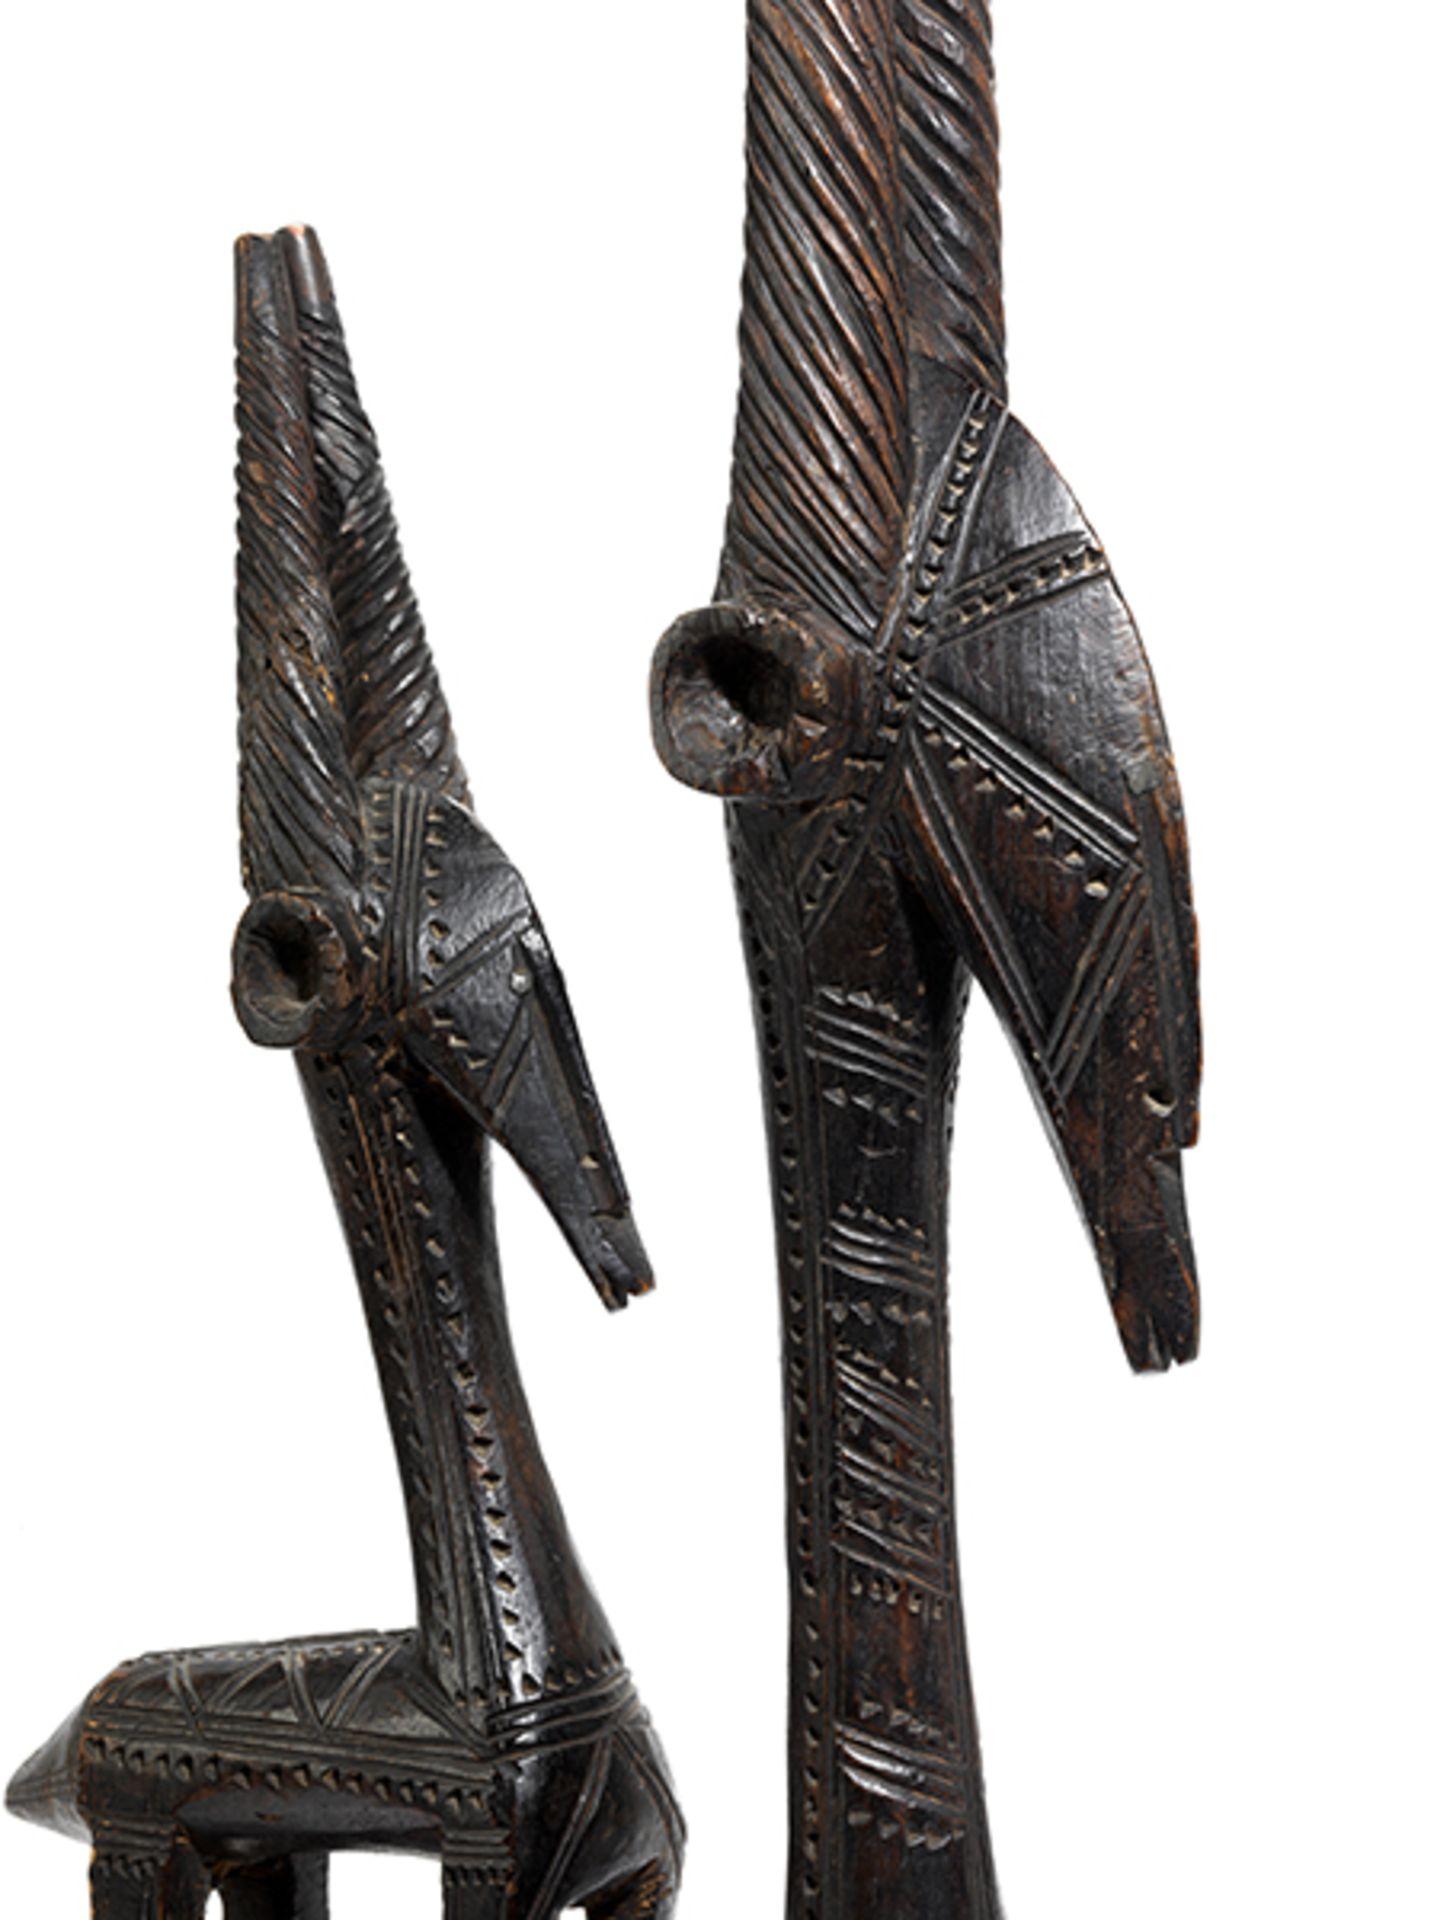 Los 890 - Bamana-Aufsatzmaske Höhe: 83 cm. Volk der Bamana, heutiges Mali. Solche Bamana-Schnitzwerke...